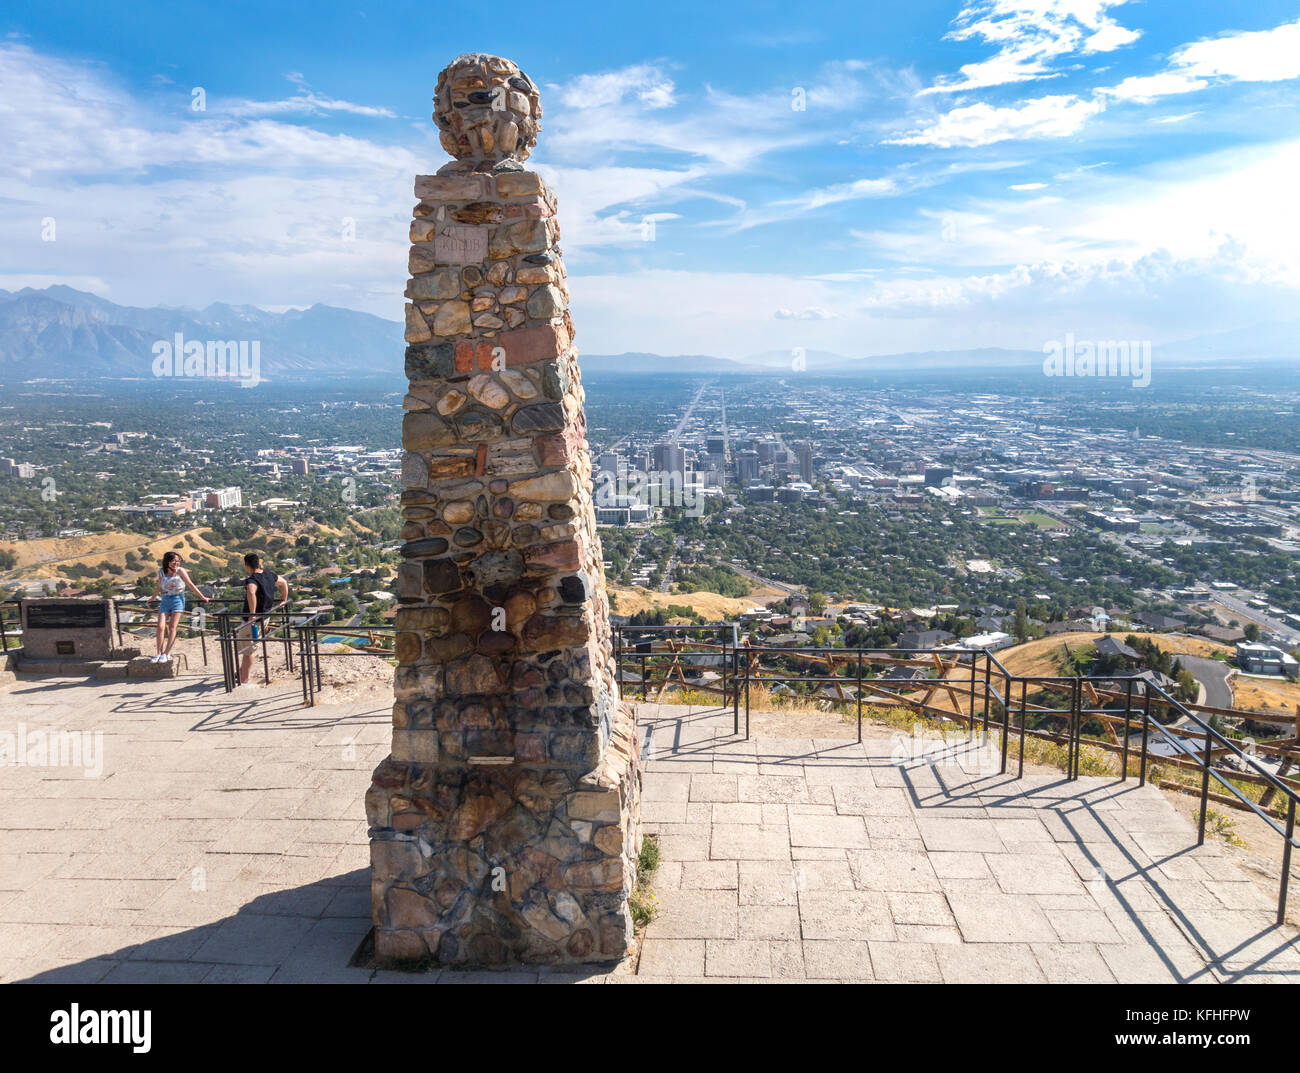 Salt Lake City Ensign Peak mirador. Pareja joven en Ensign Peak vista point con vistas a SLC Foto de stock